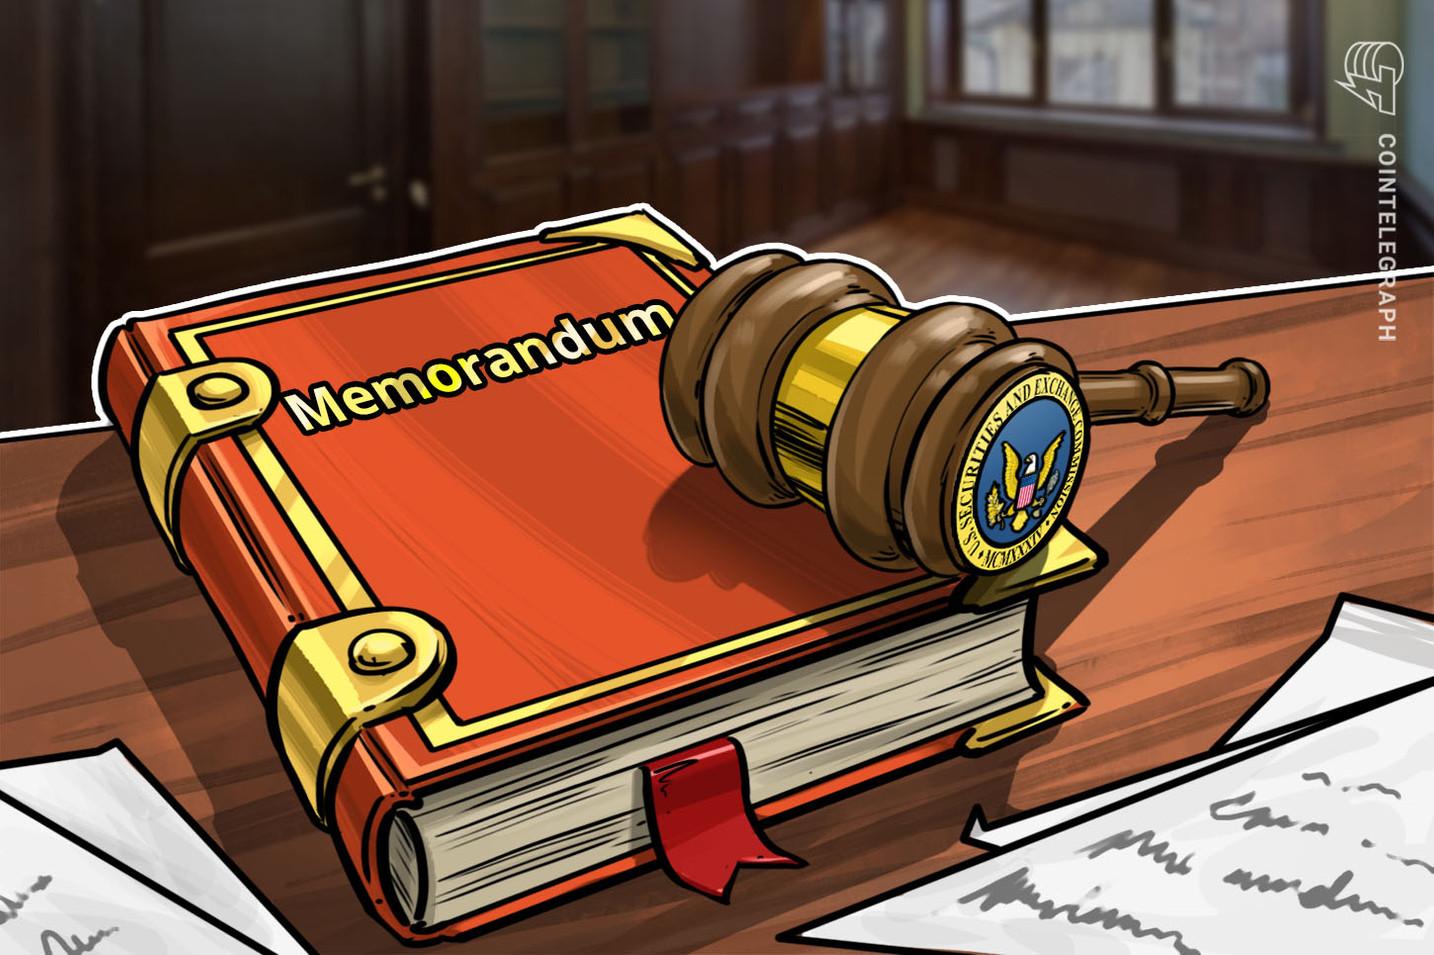 SEC Publishes Memorandum From Meeting on SolidX, VanEck BTC ETF Proposal